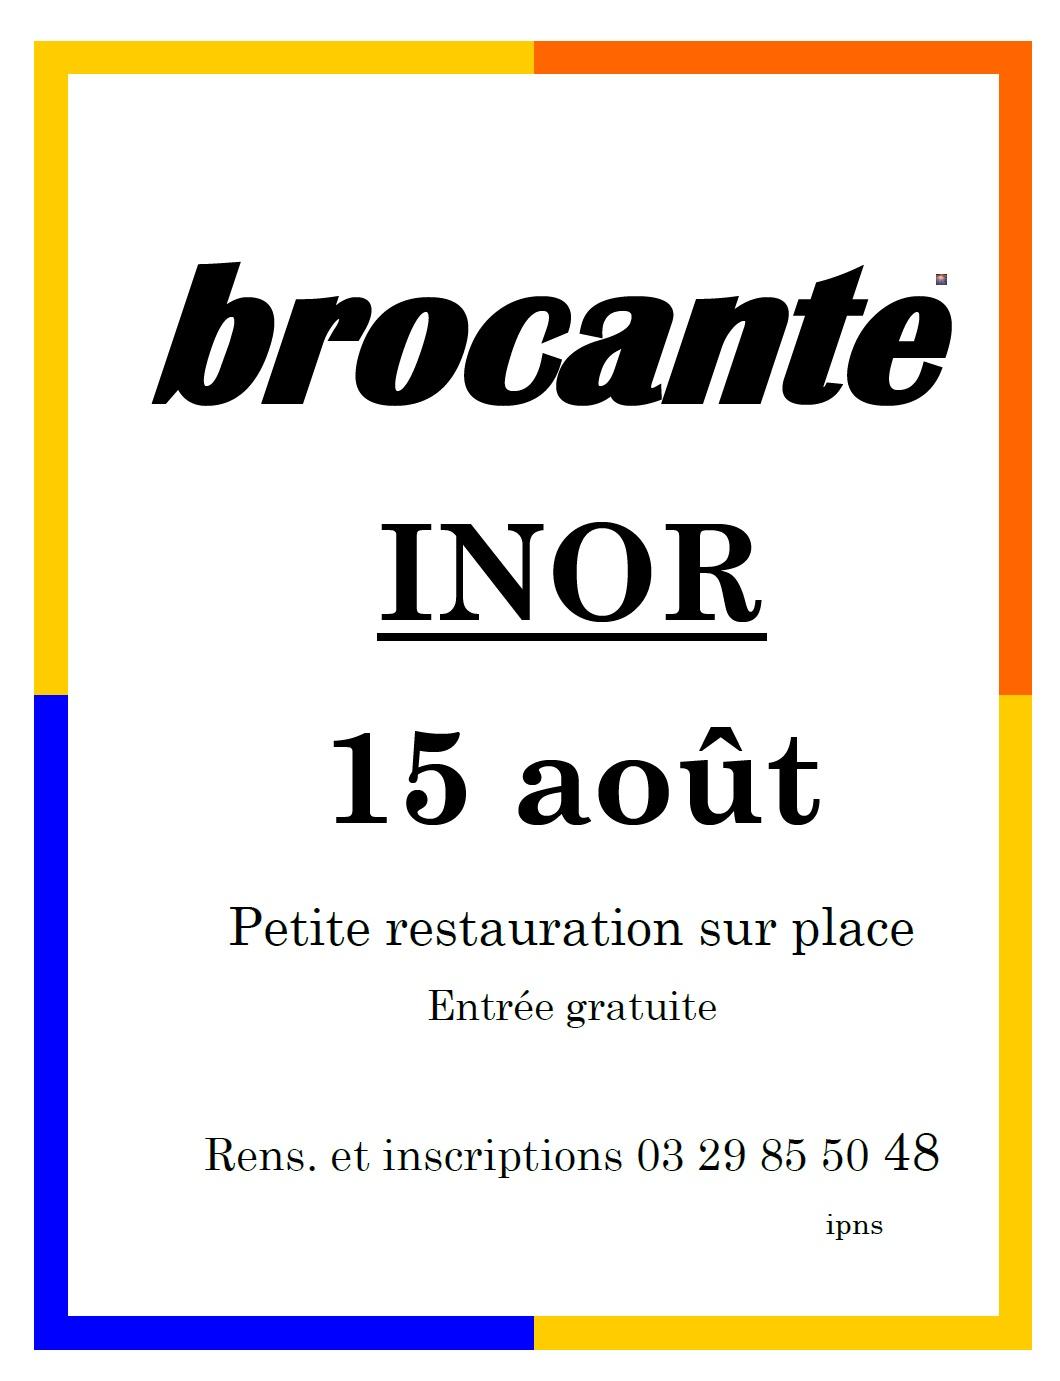 BROCANTE / VIDE GRENIER Inor   2021-08-15